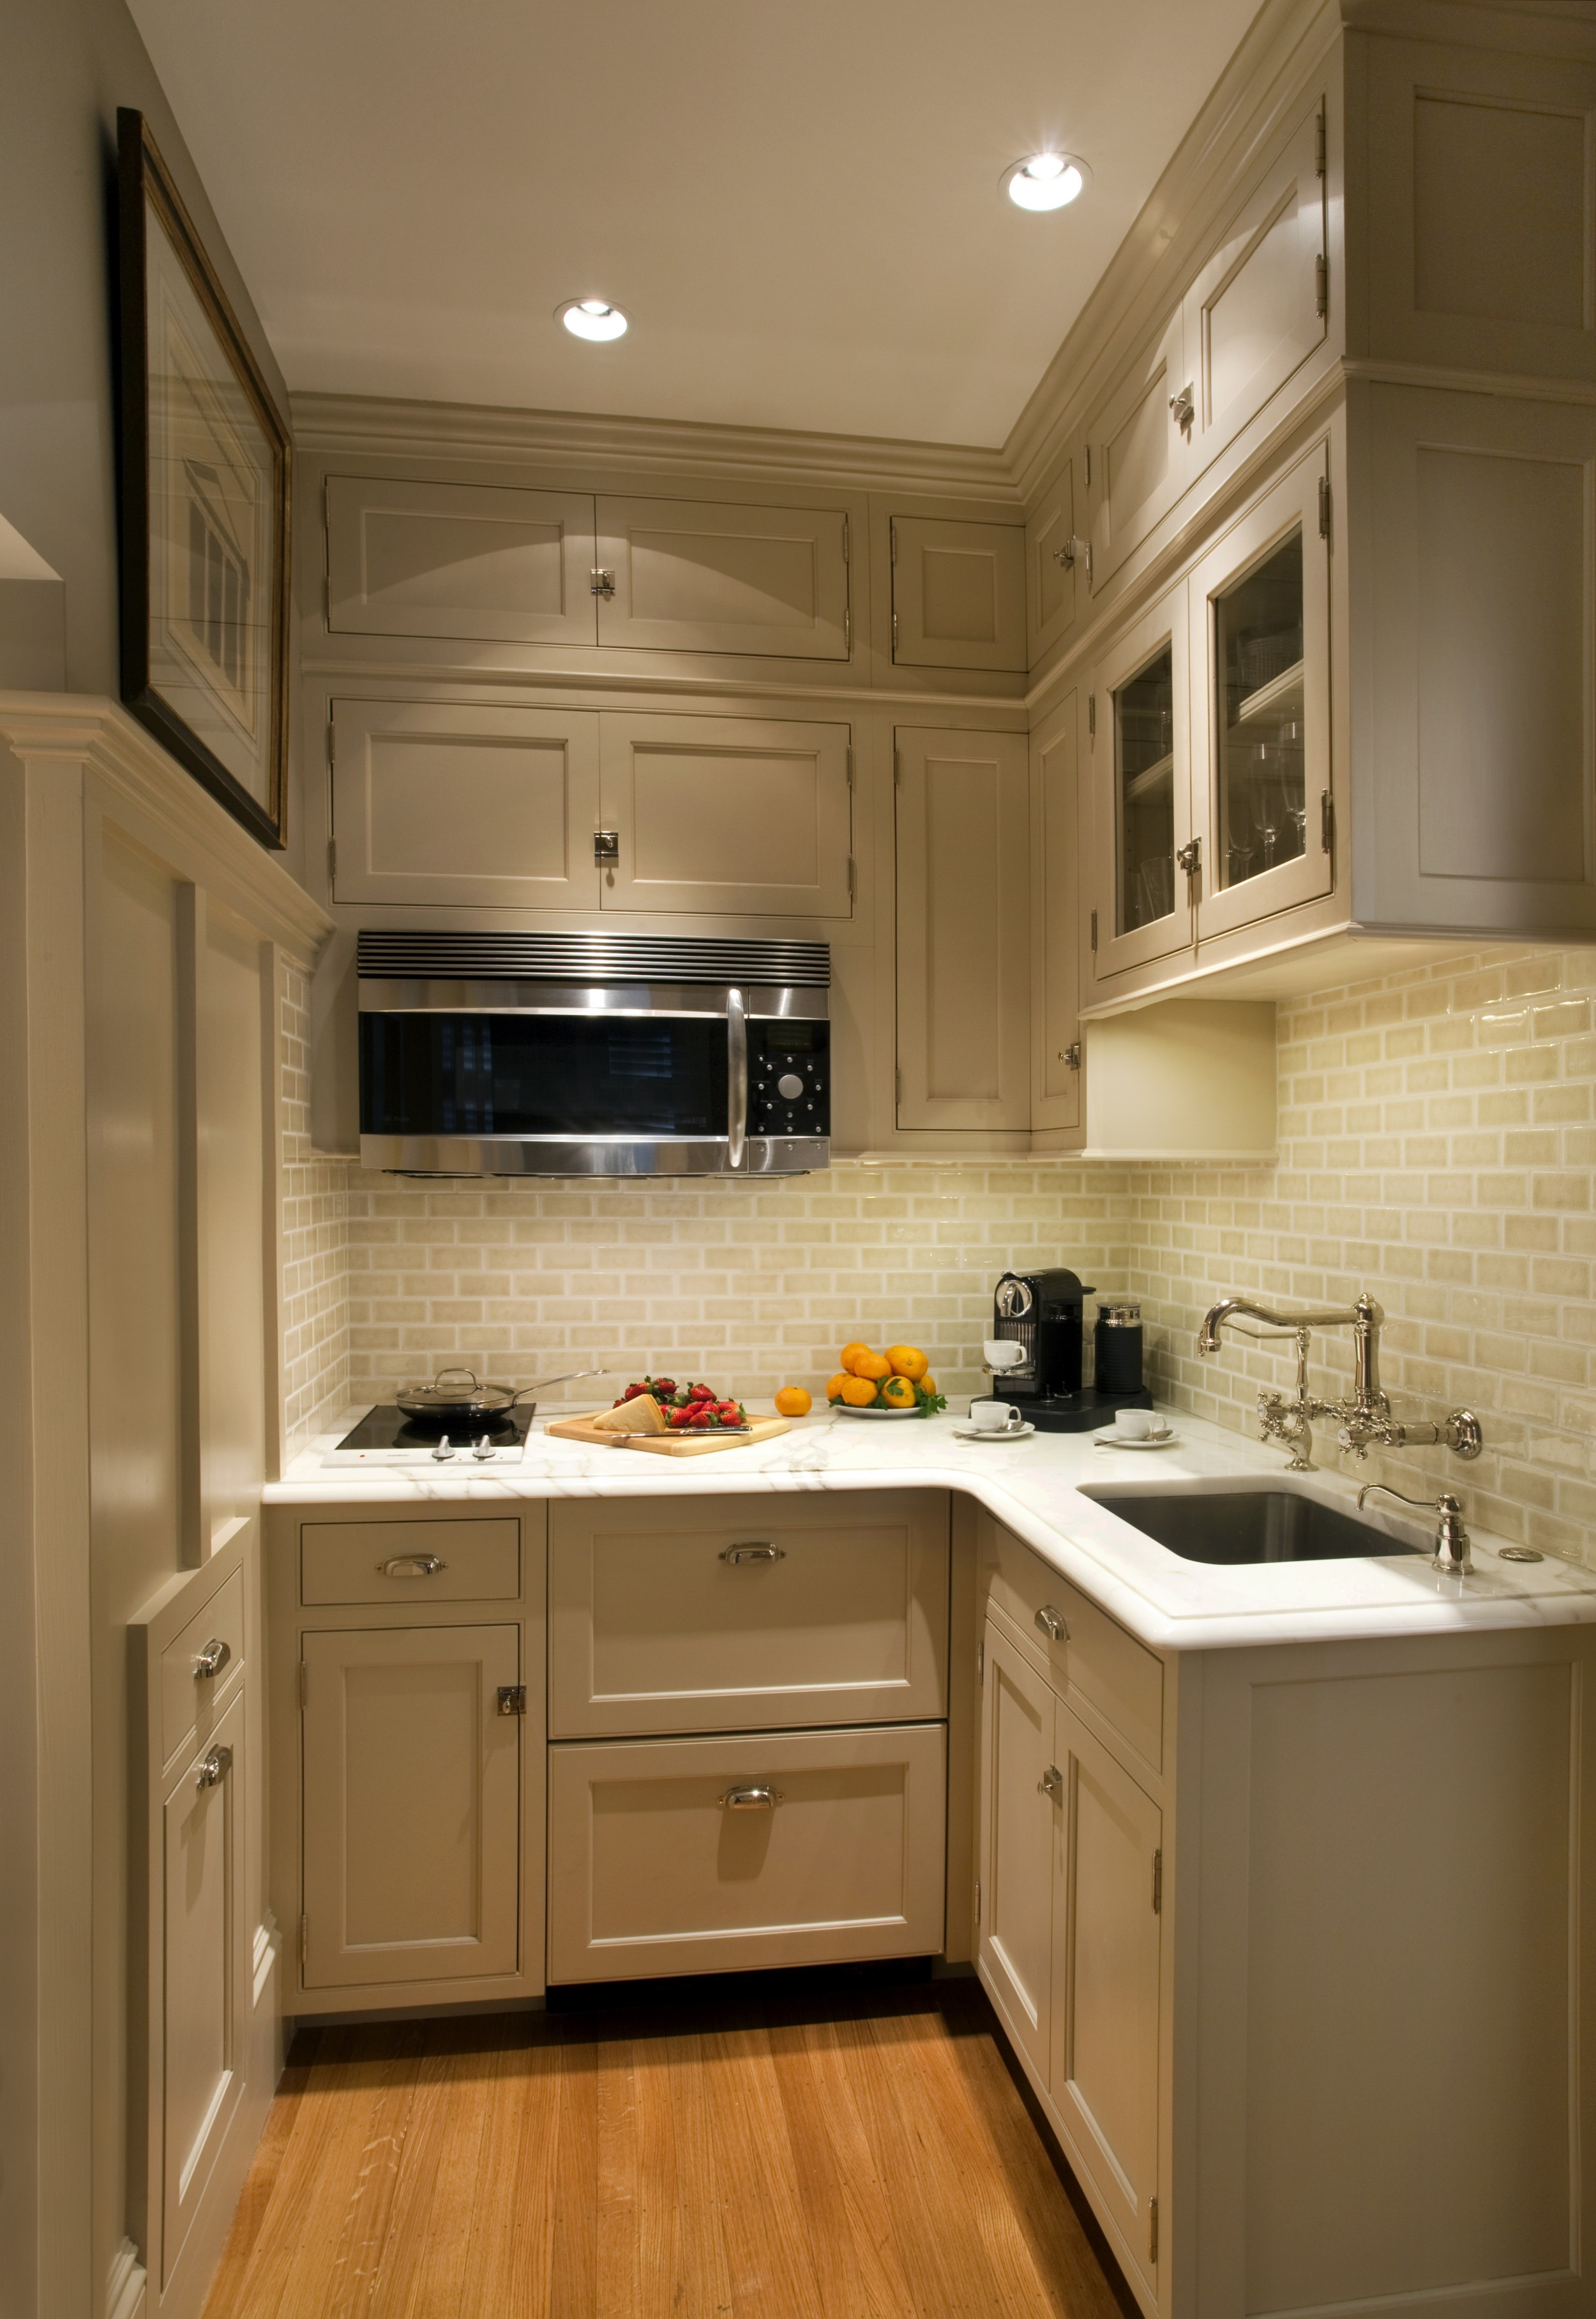 74MtVernon_AFTER.HiRes_Kitchen3 copy.jpg